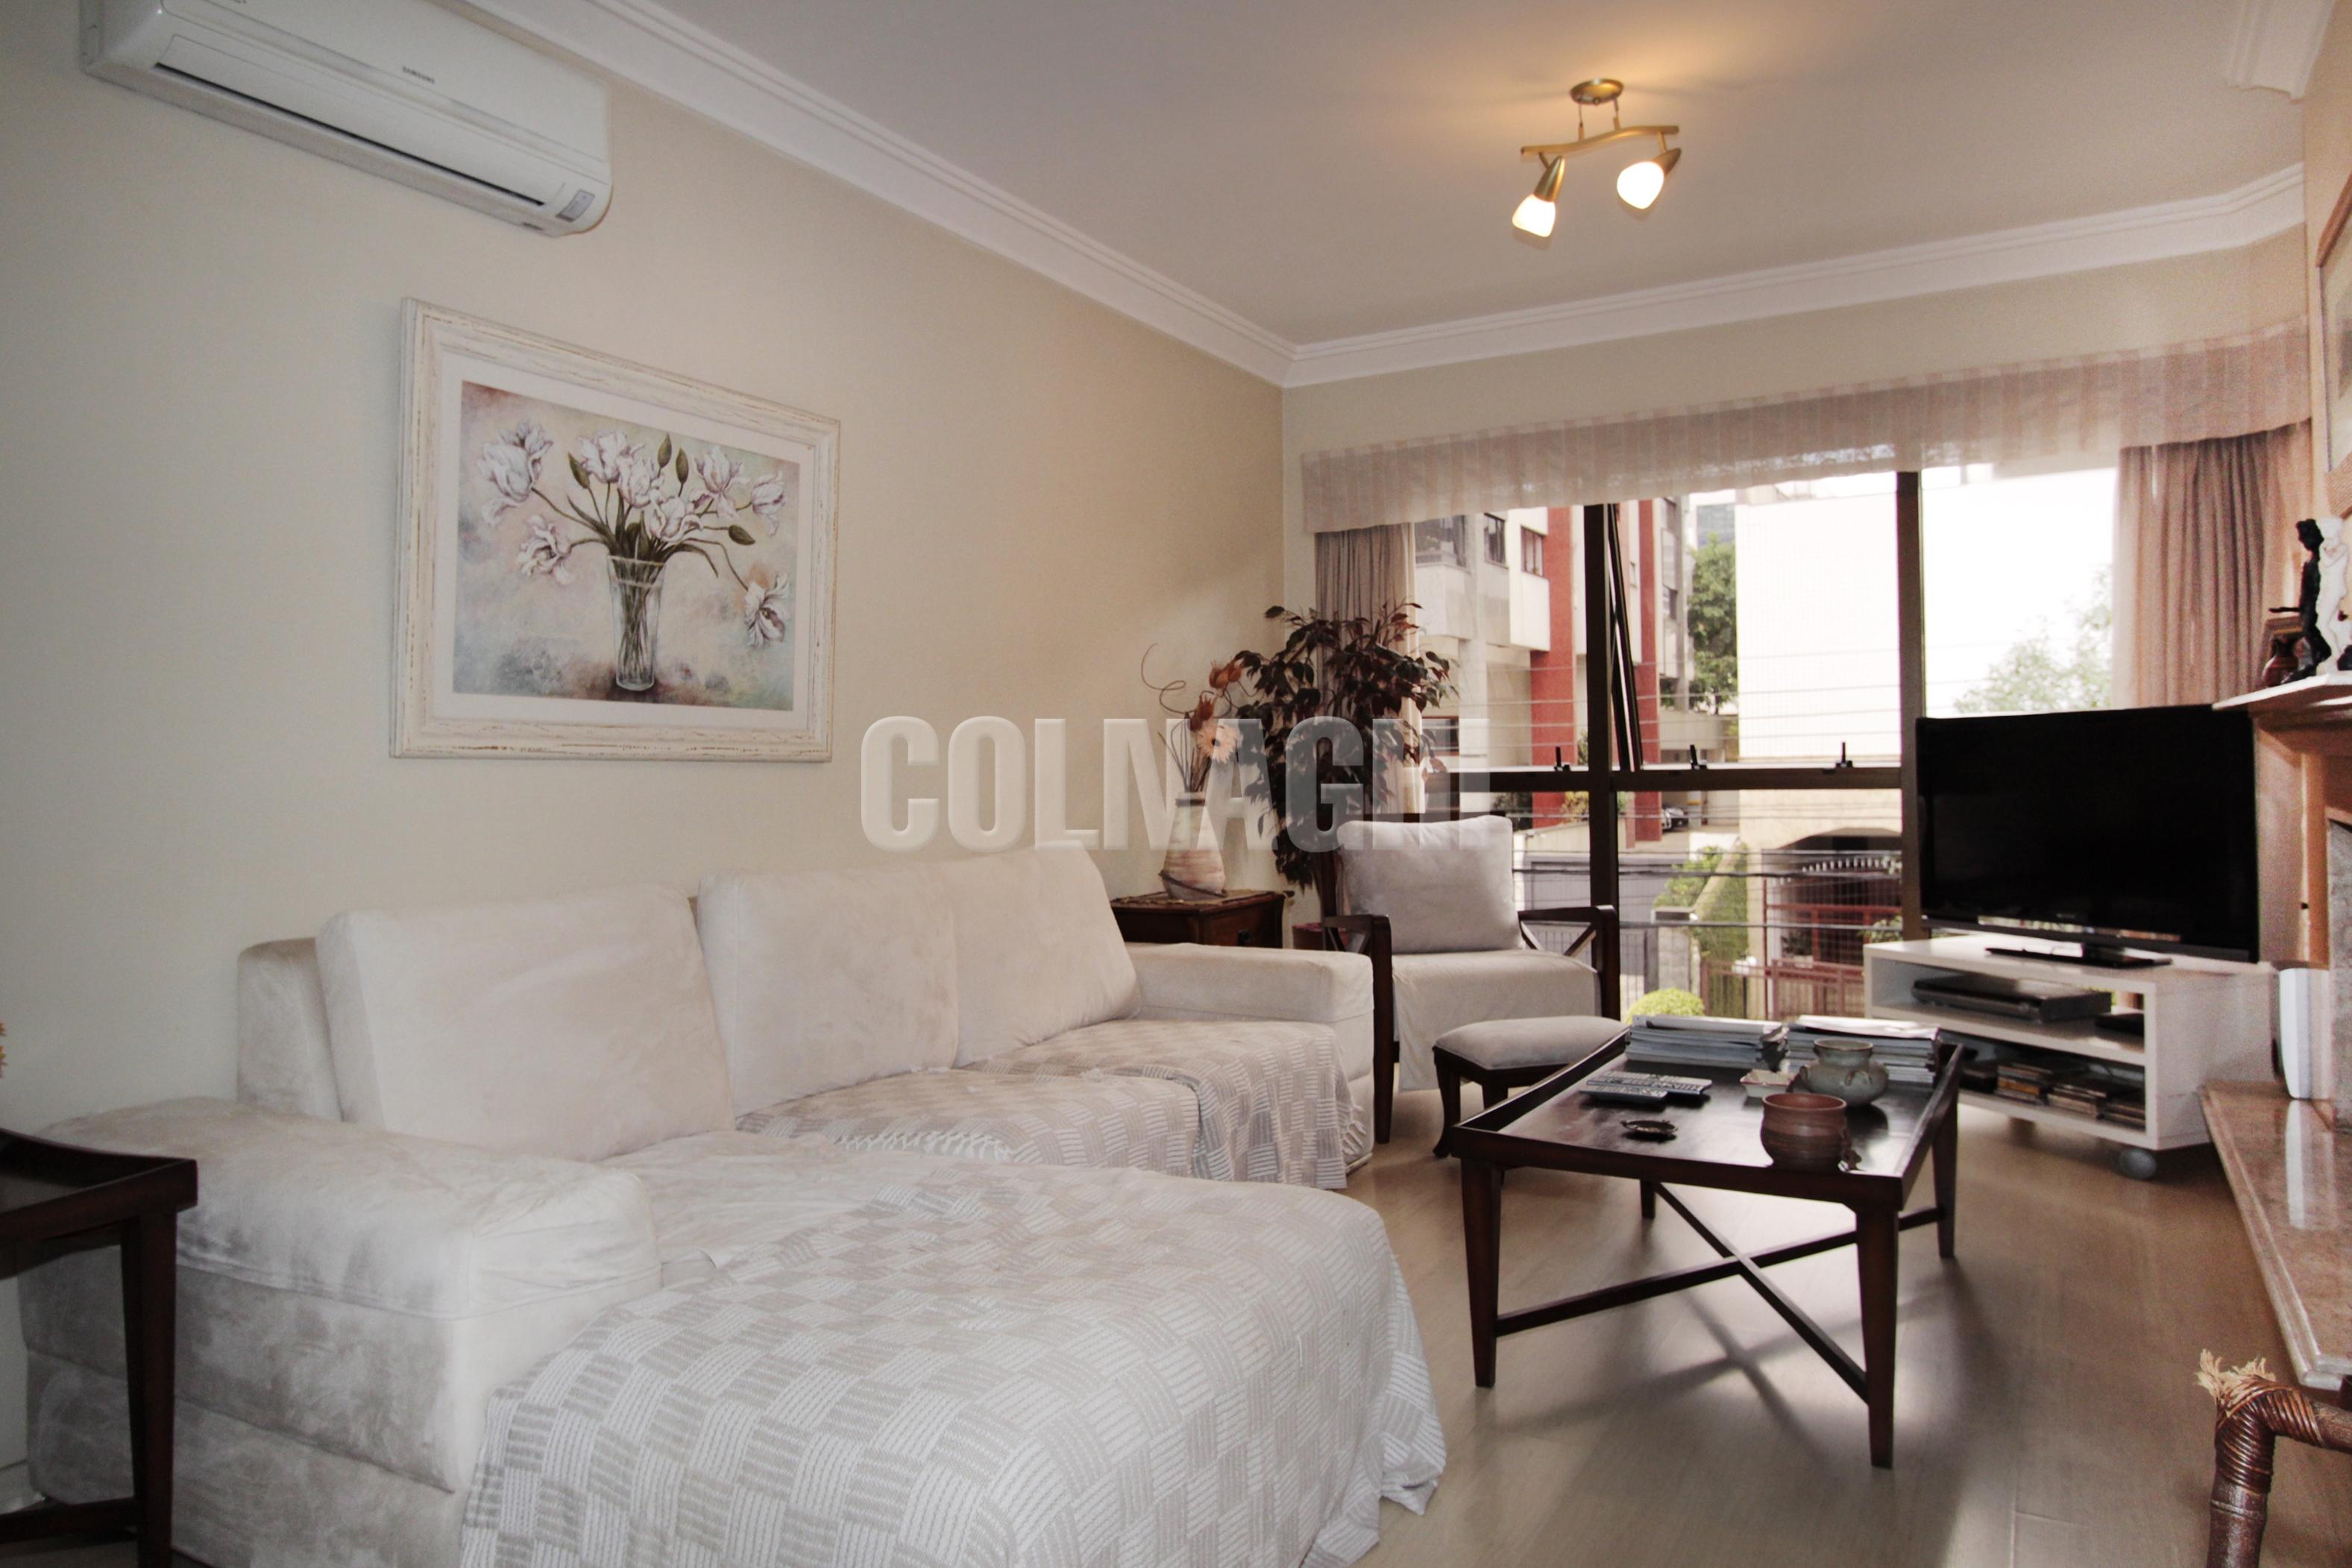 Piaza Nobili - Apto 3 Dorm, Bela Vista, Porto Alegre (CL1328) - Foto 3